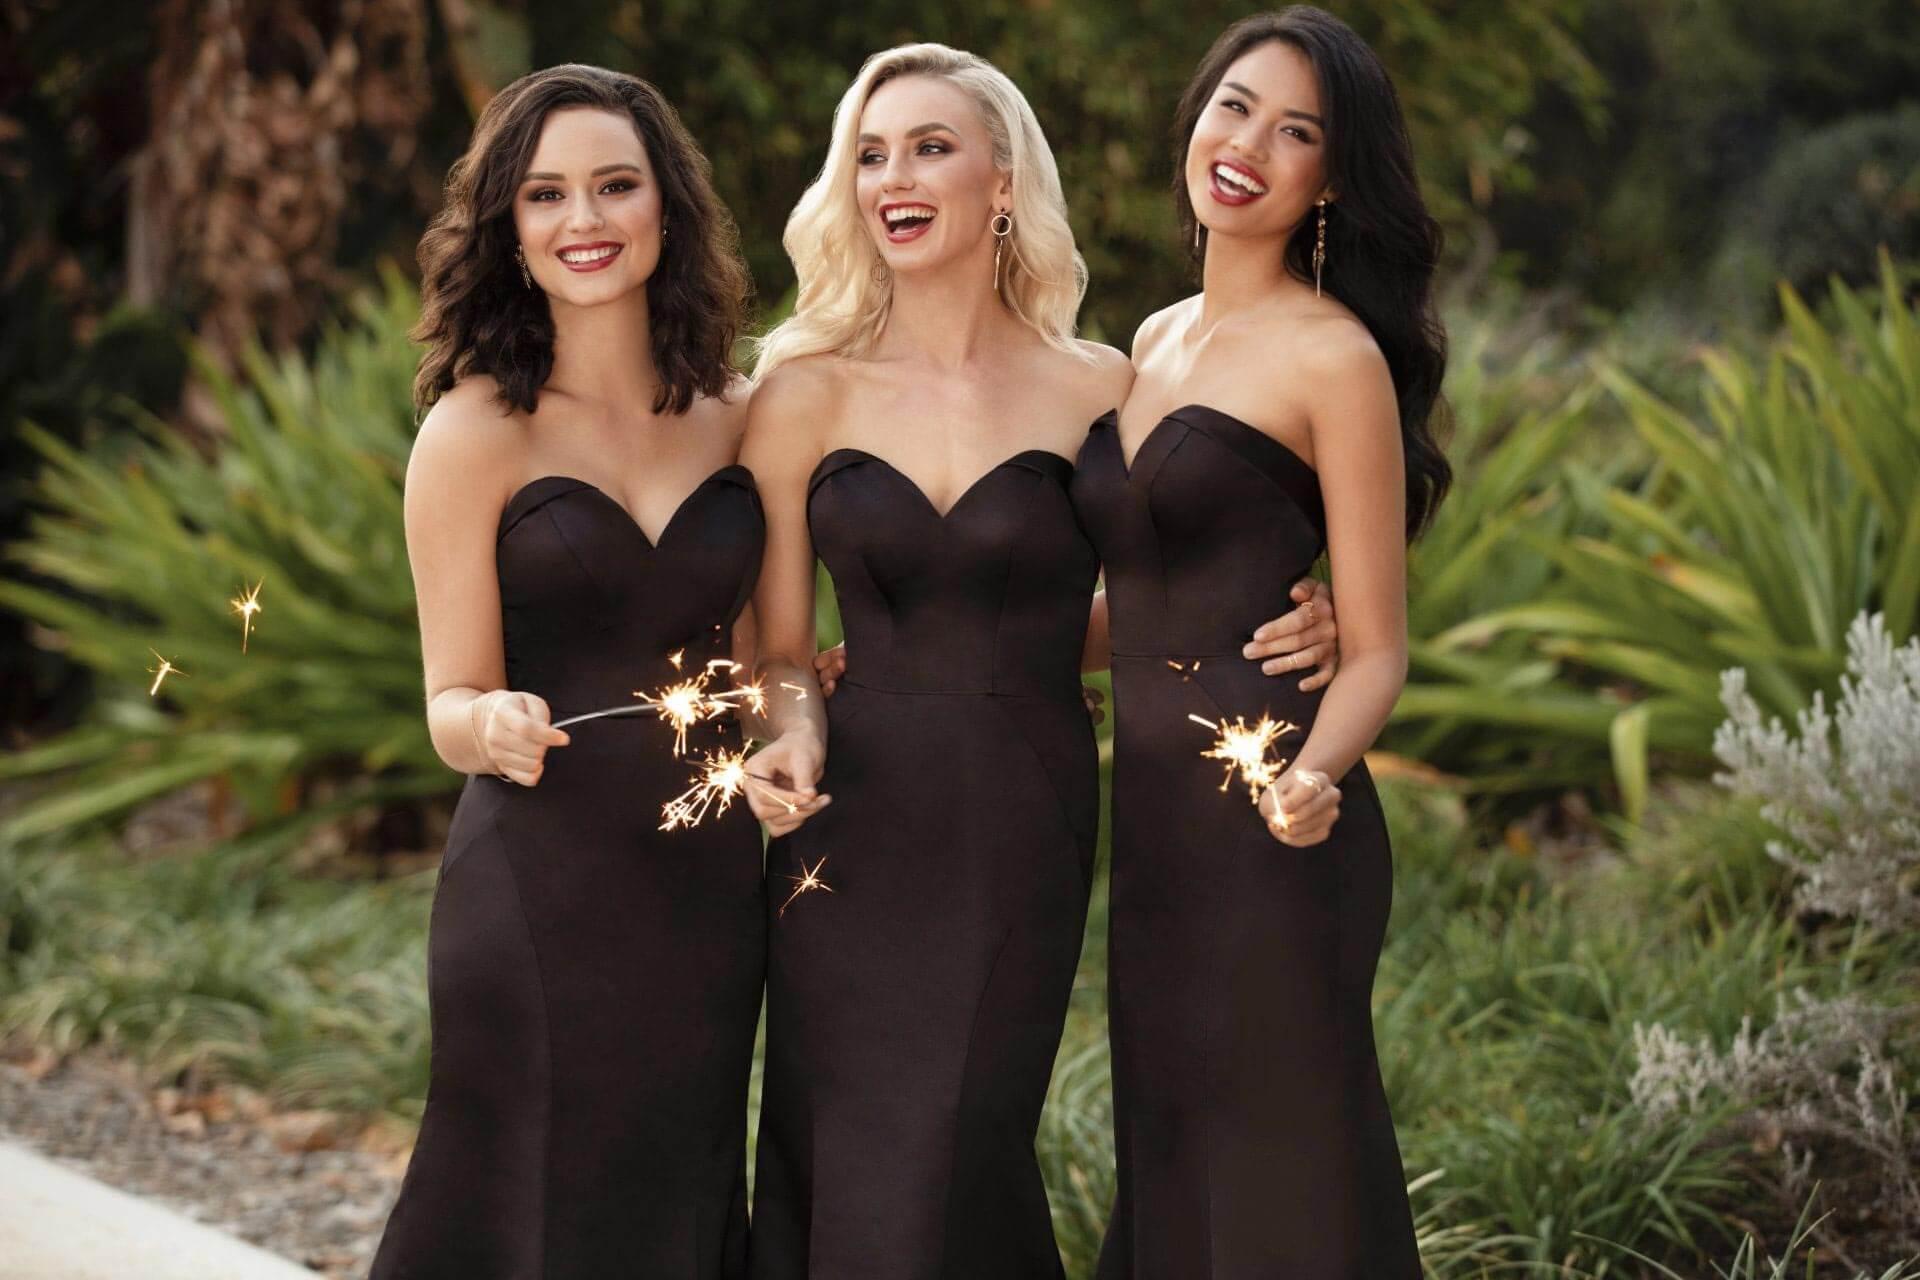 Bridal Party - Sorella Vita